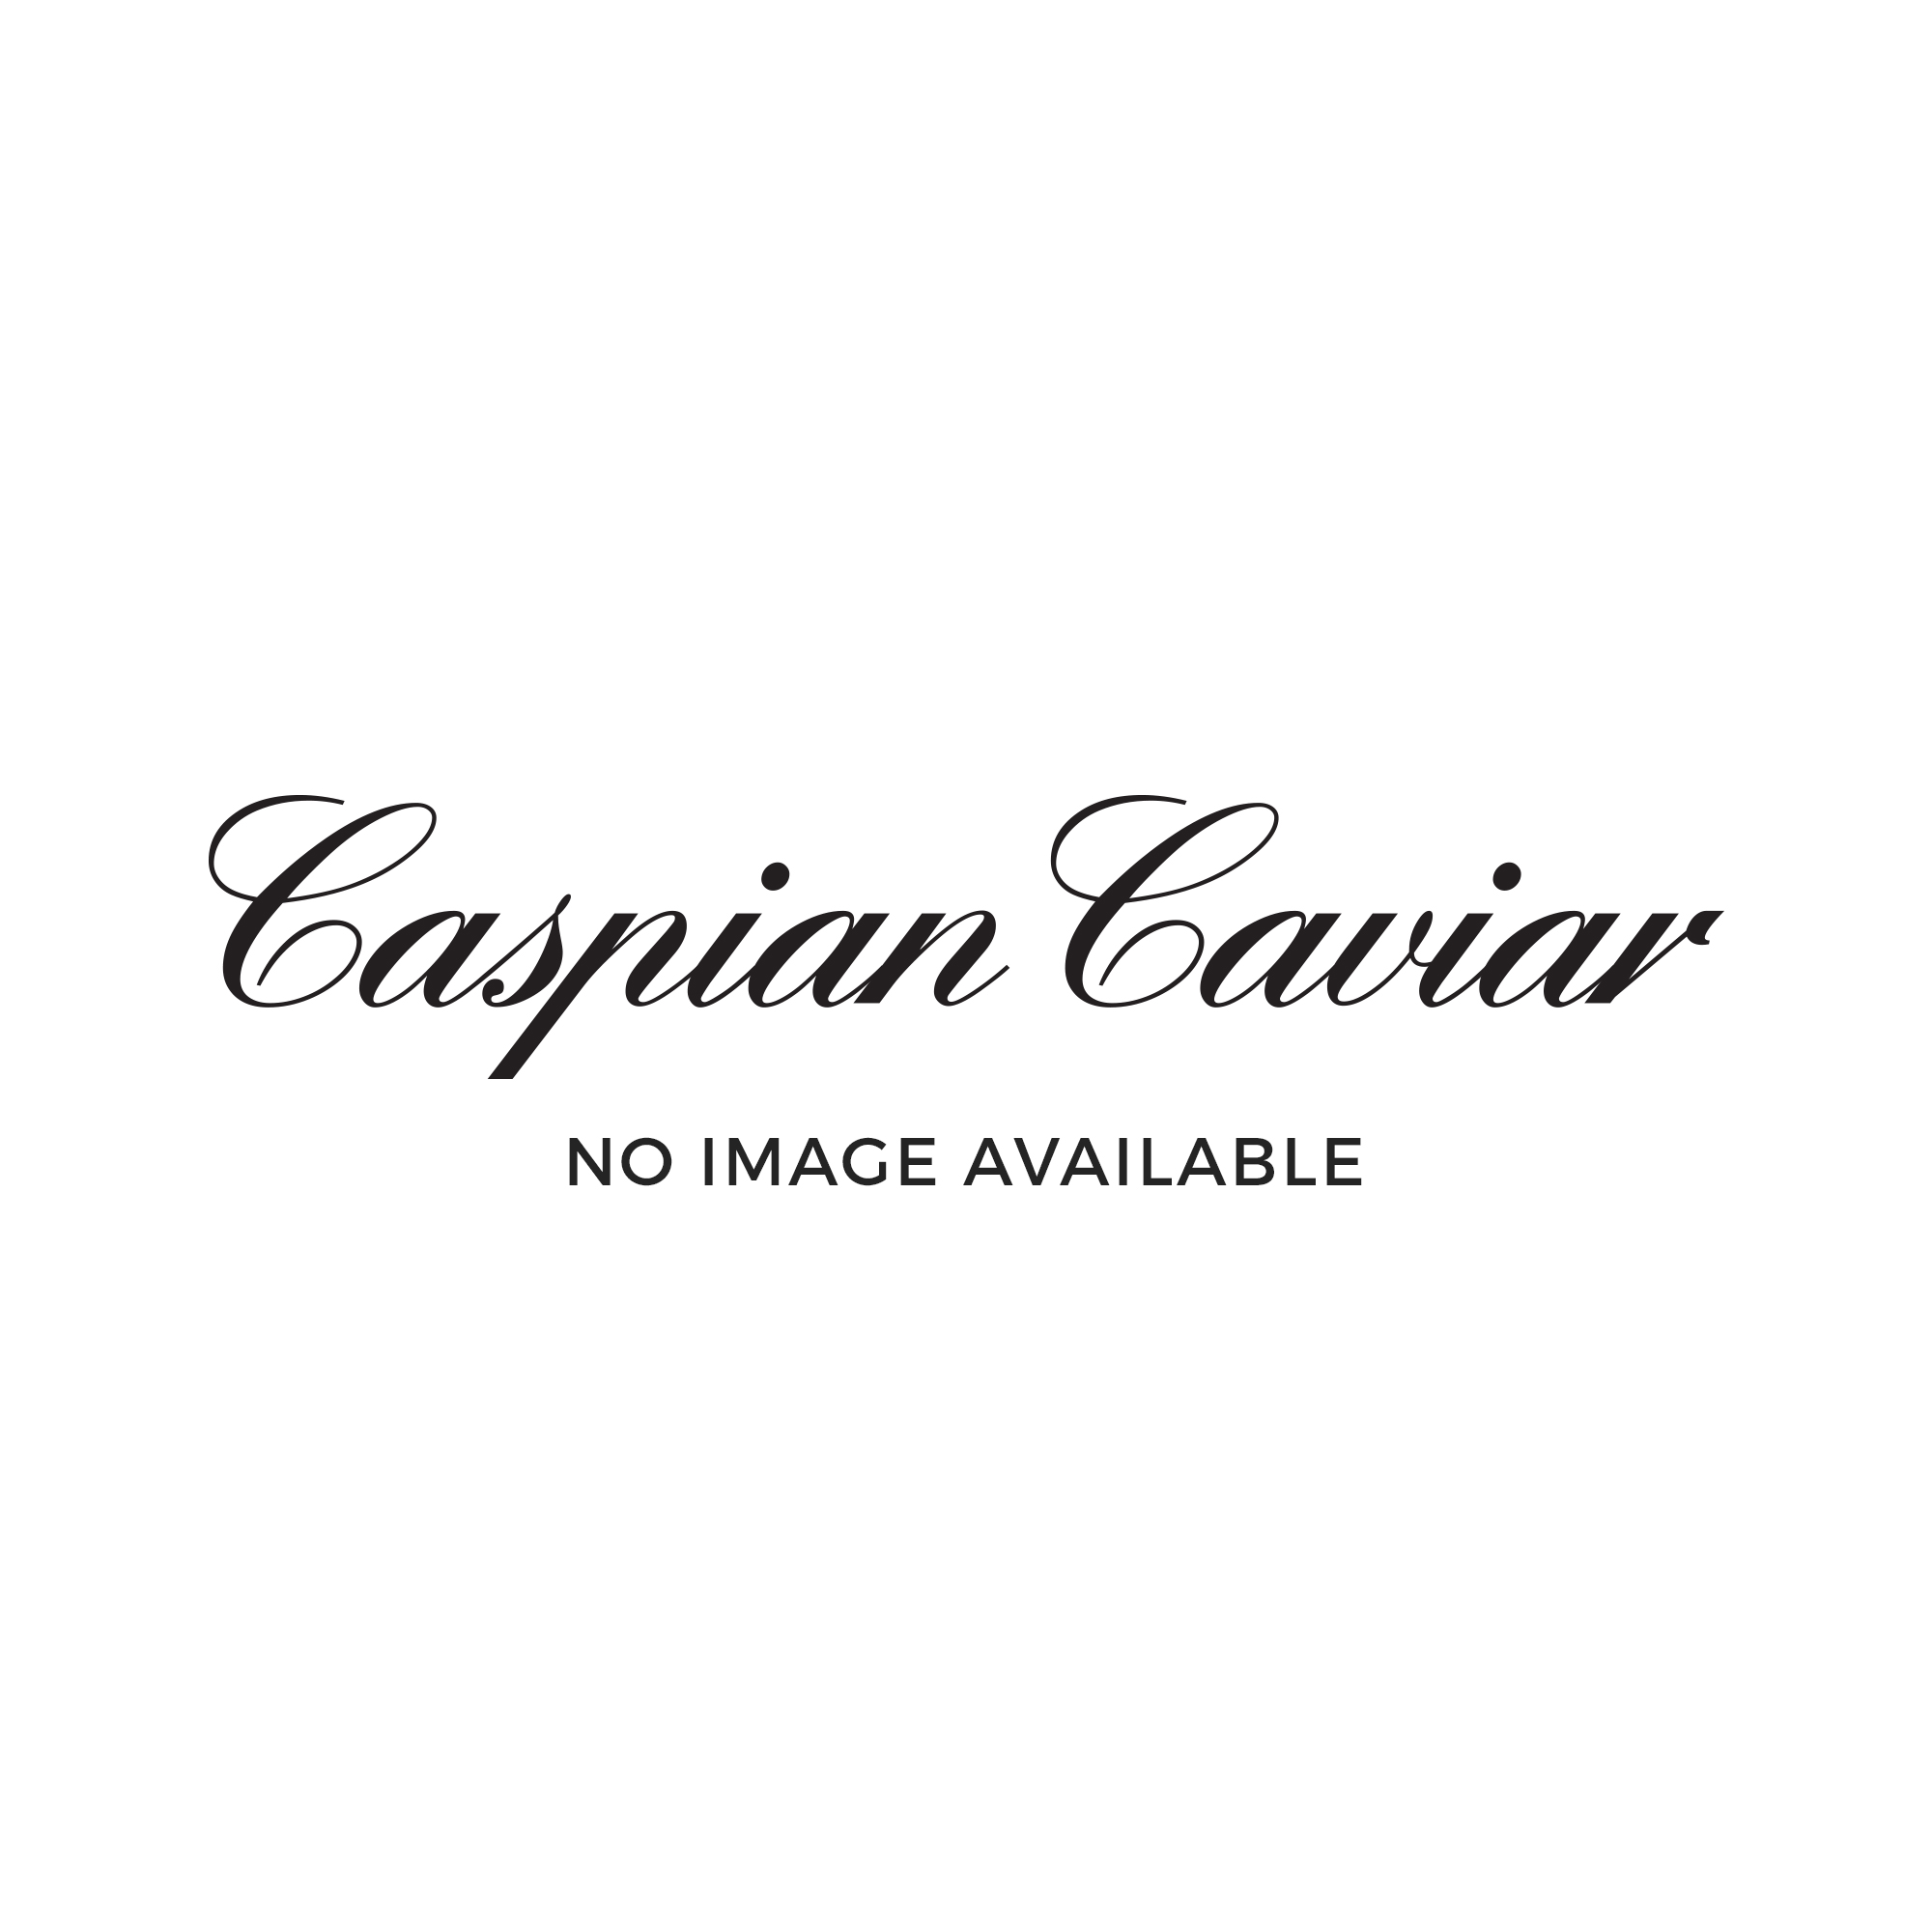 Caspian Caviar House Champagne 75cl